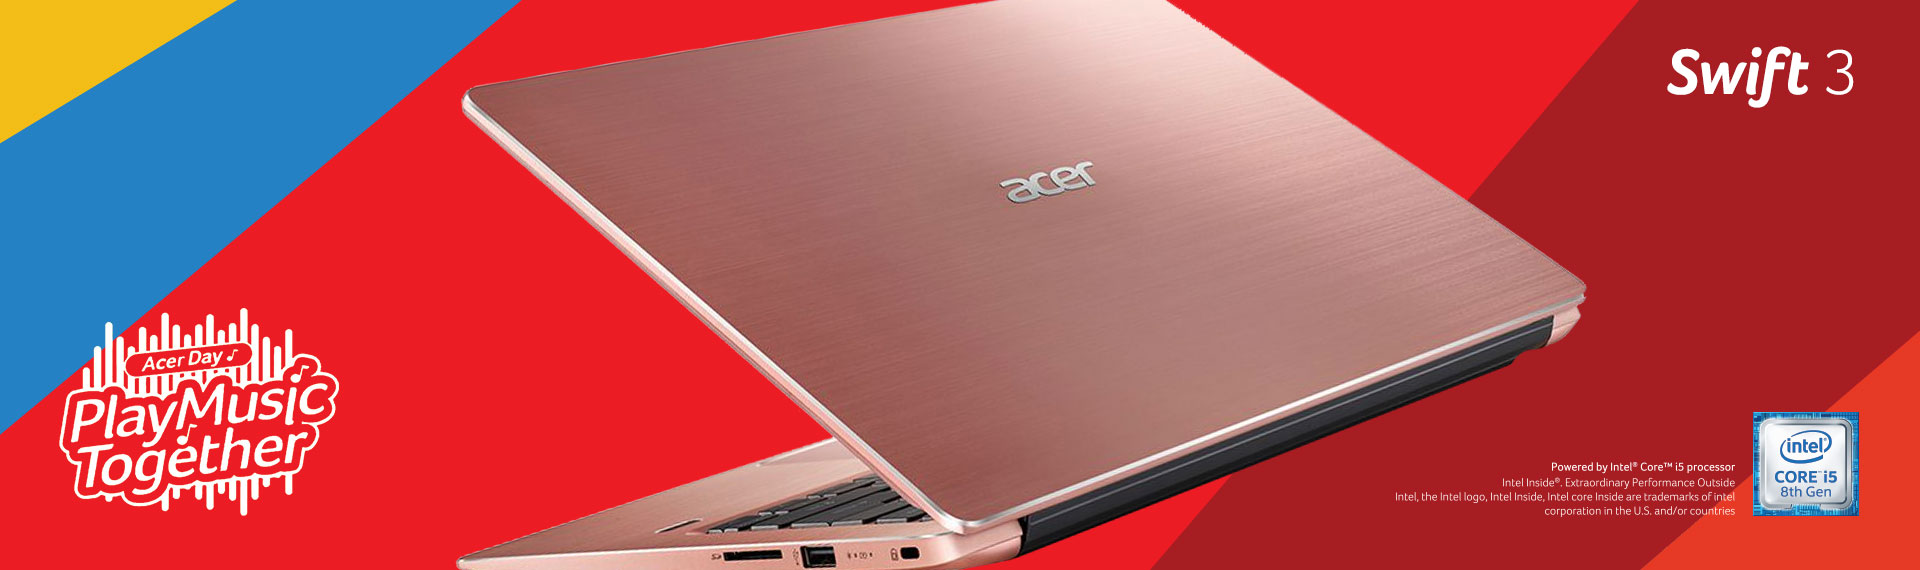 Swift 3 Acer Day Edition, Laptop Tipis Terbaik untuk Kamu yang Aktif!